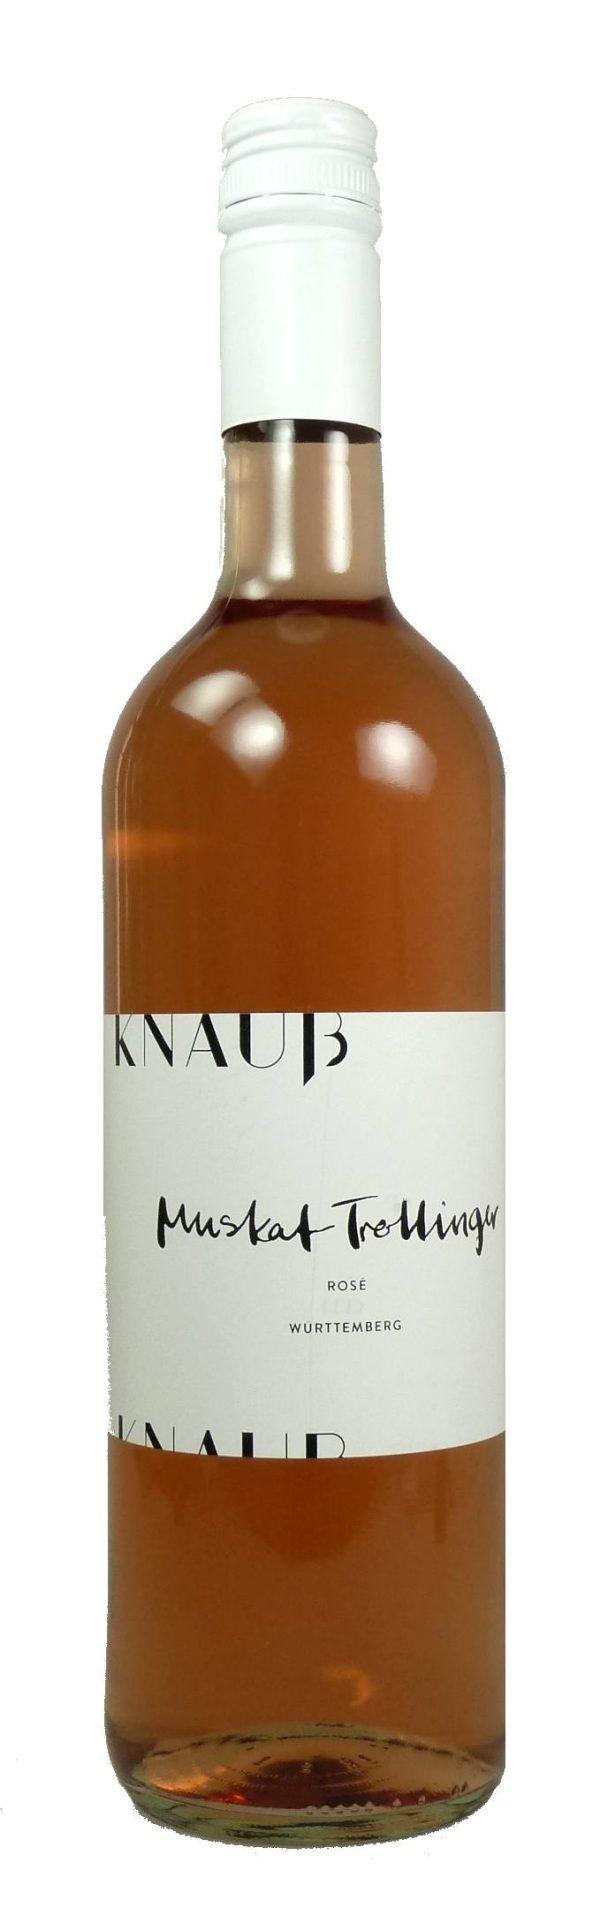 Muskattrollinger Rosé Qualitätswein 2016